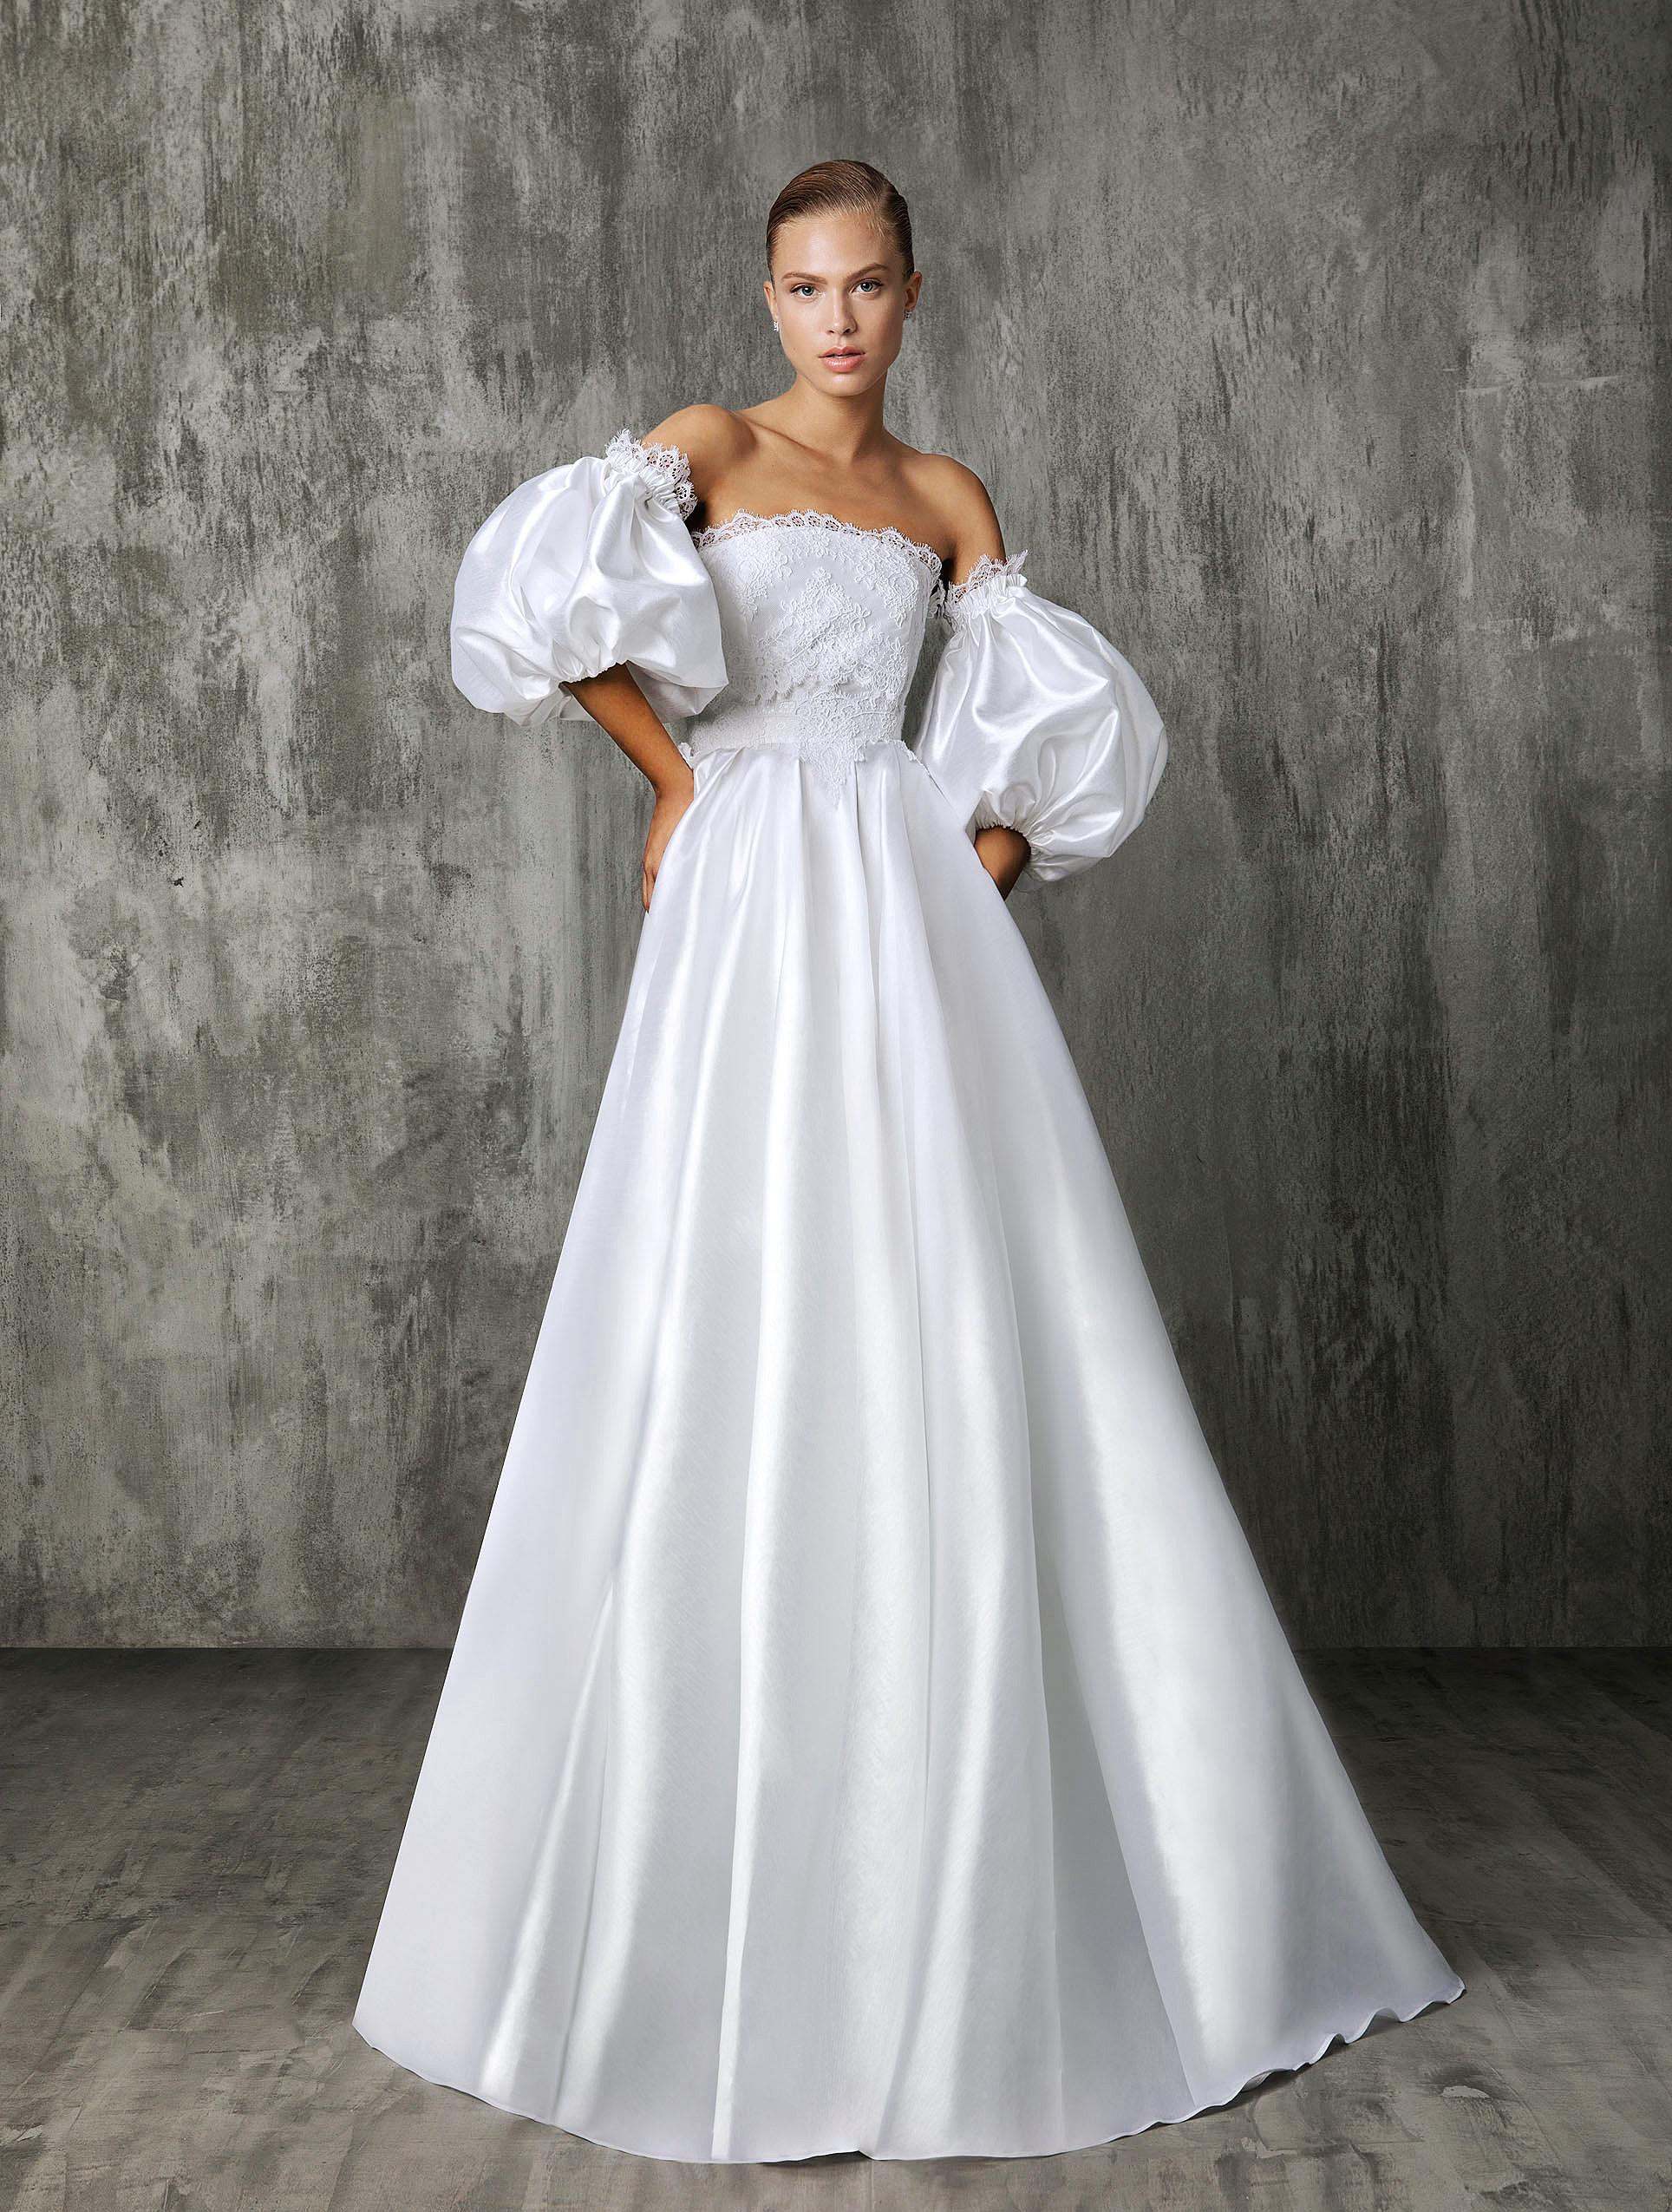 Victoria Kyriakides Puffed Sleeves Wedding Dress Fall 2018